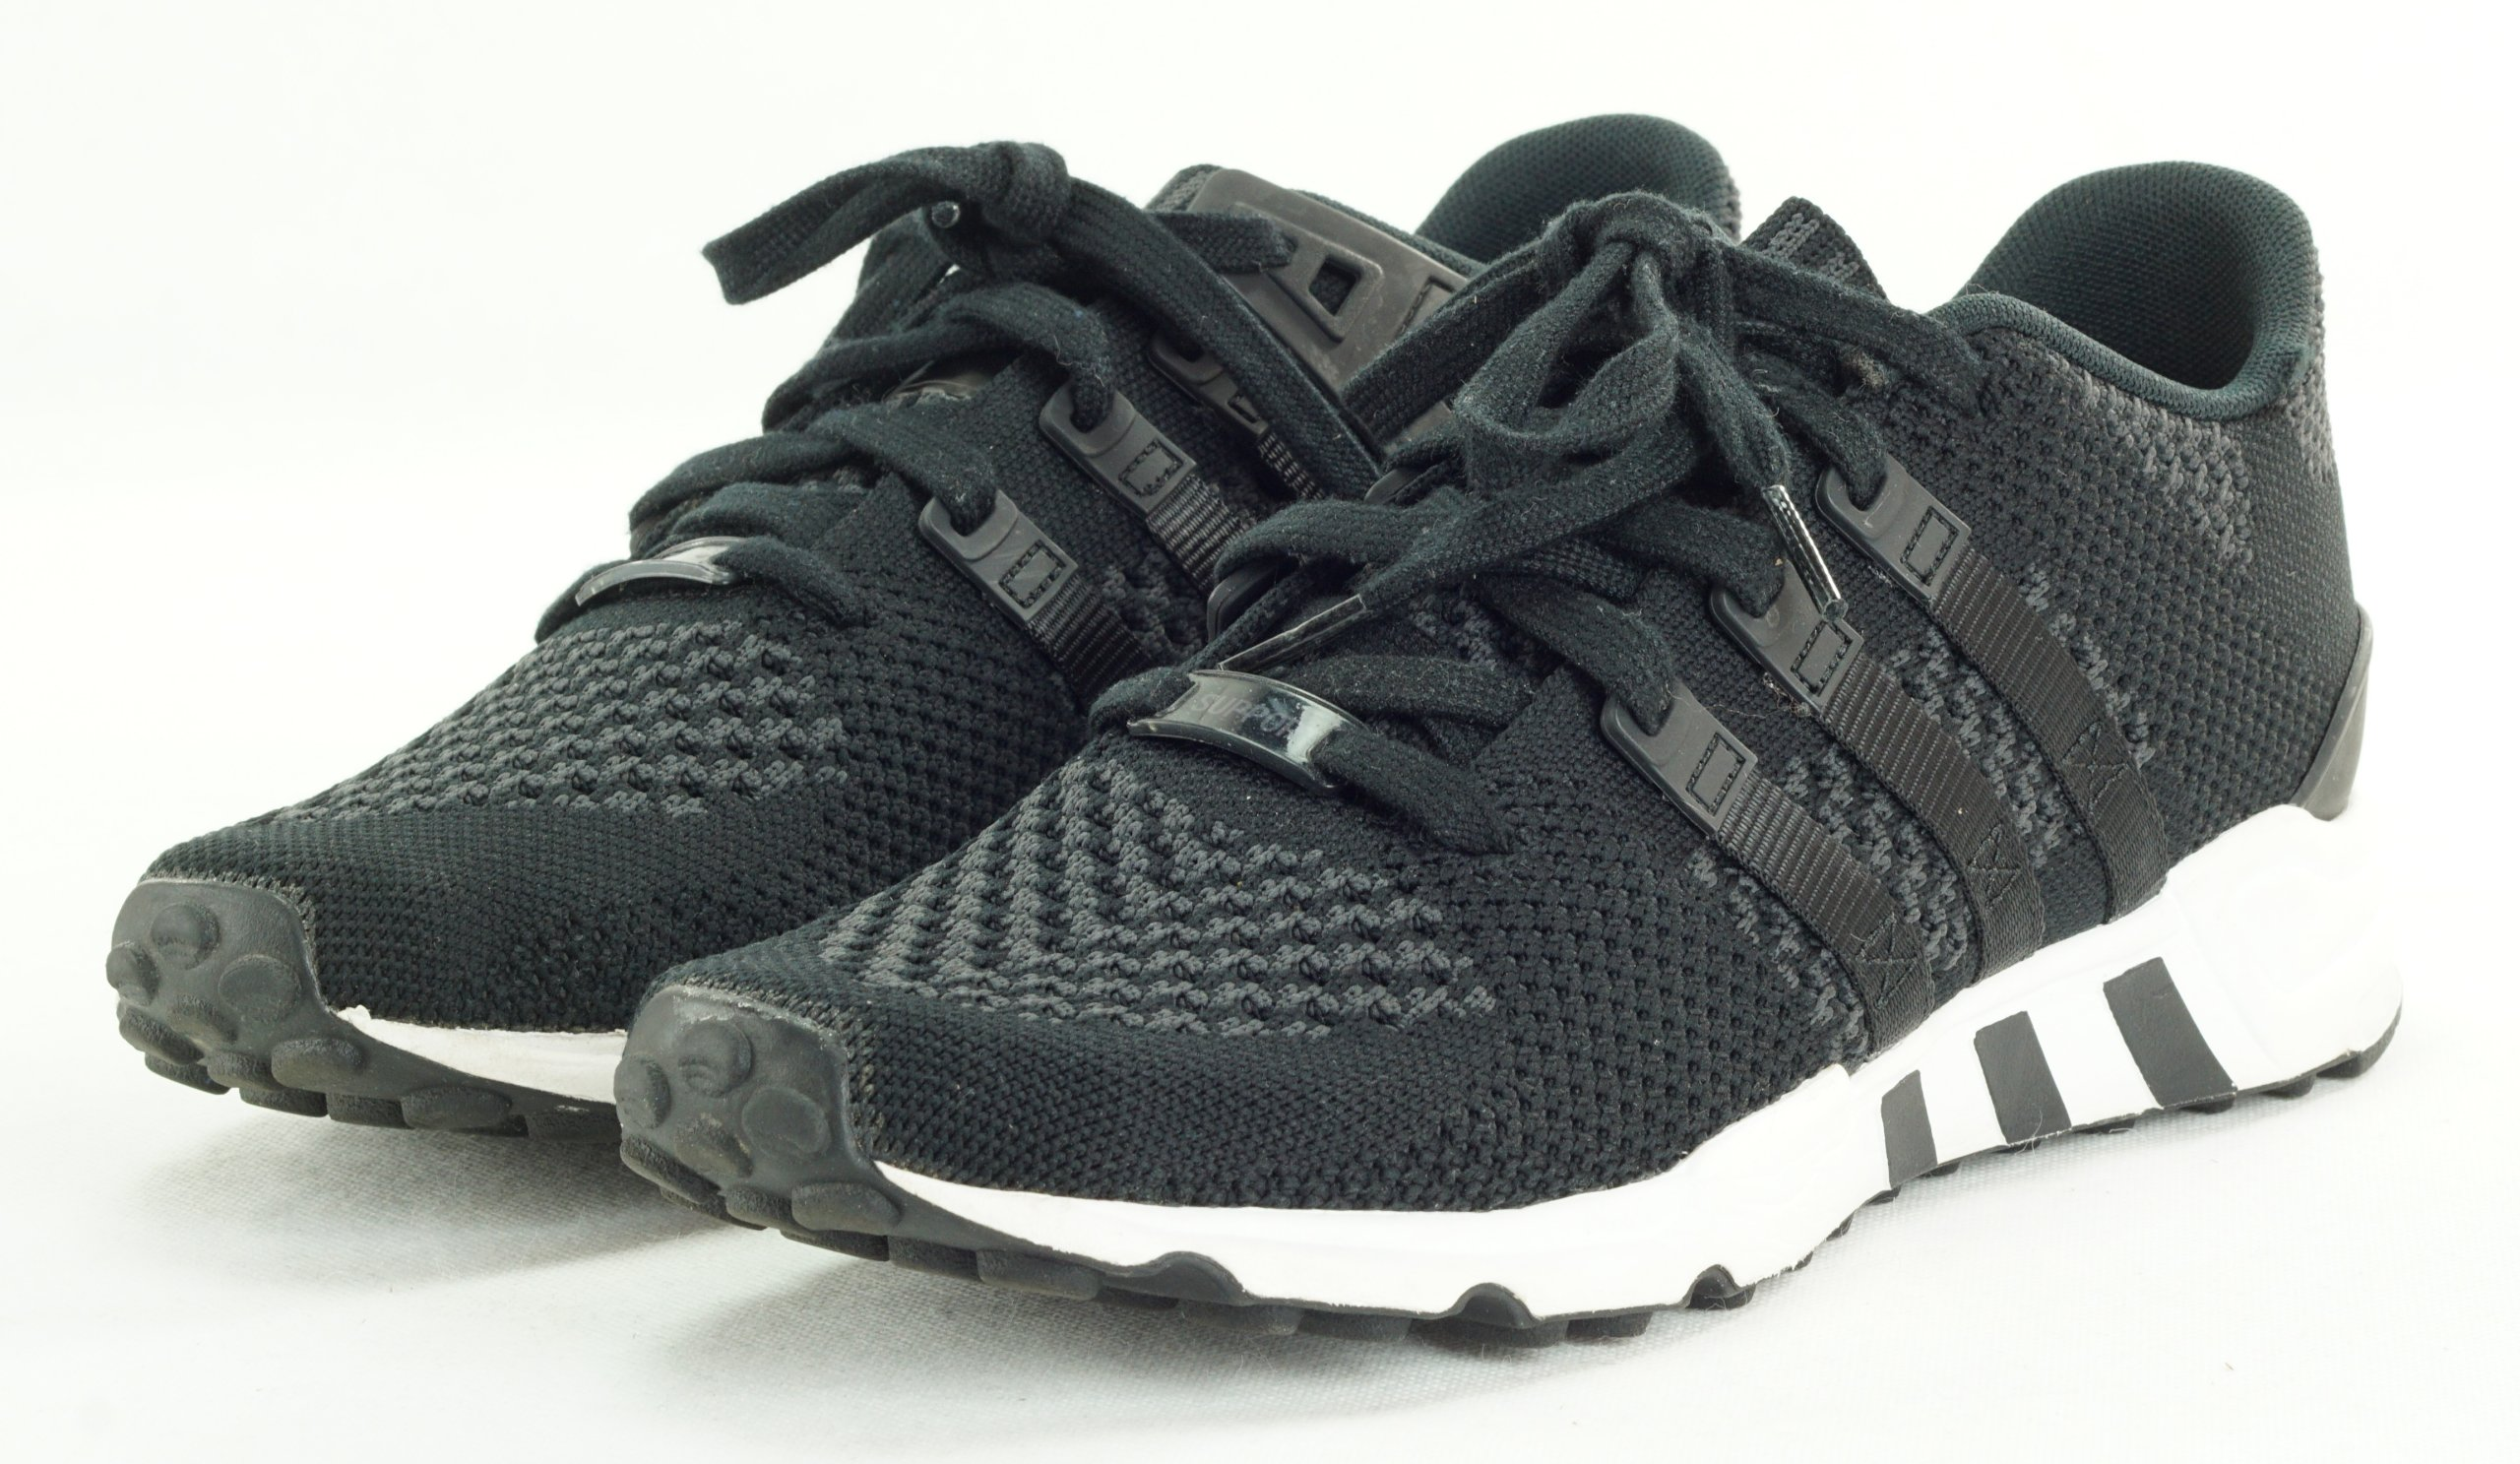 separation shoes ee8f1 02661 ADIDAS EQT SUPPORT czarne męskie R. 42 23 P7 41